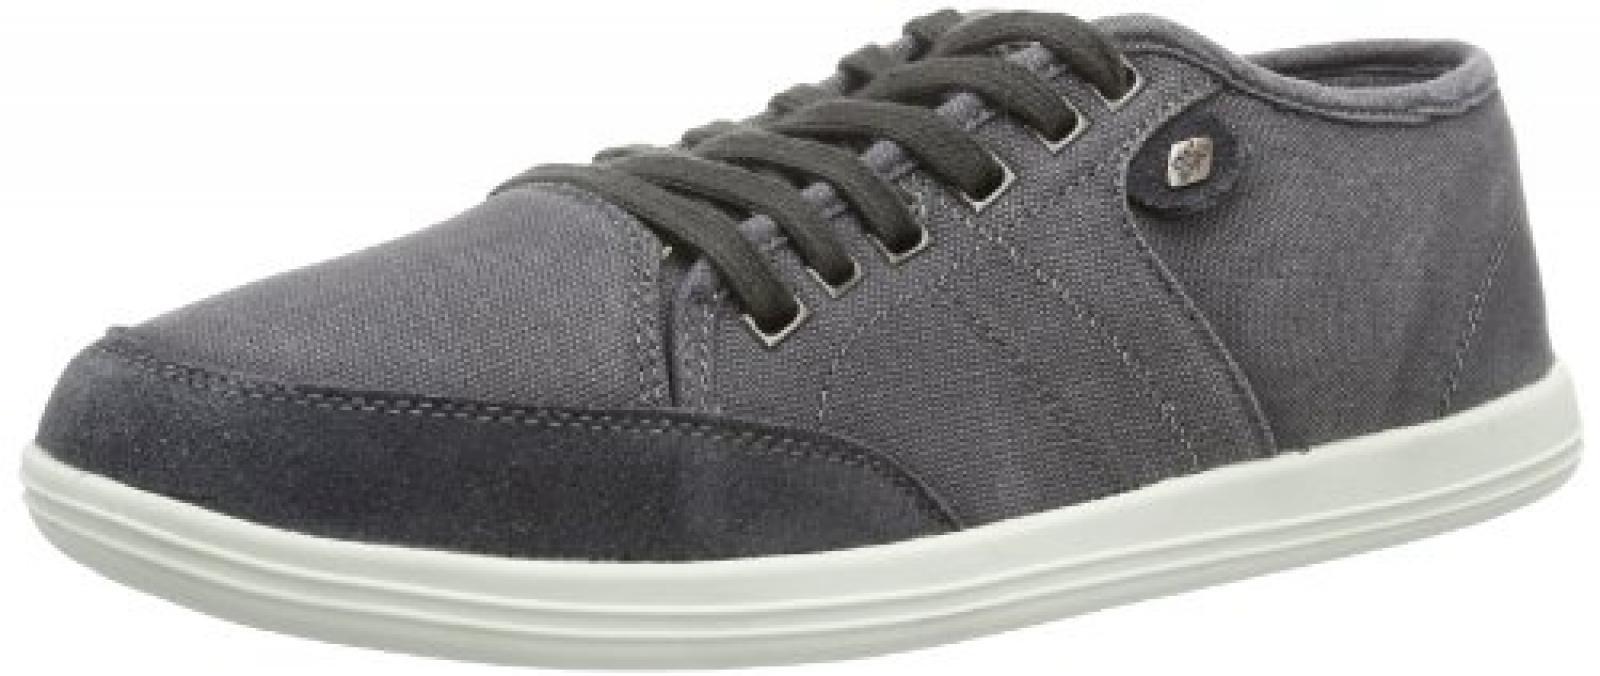 British Knights SURTO B33-3625 Herren Sneaker